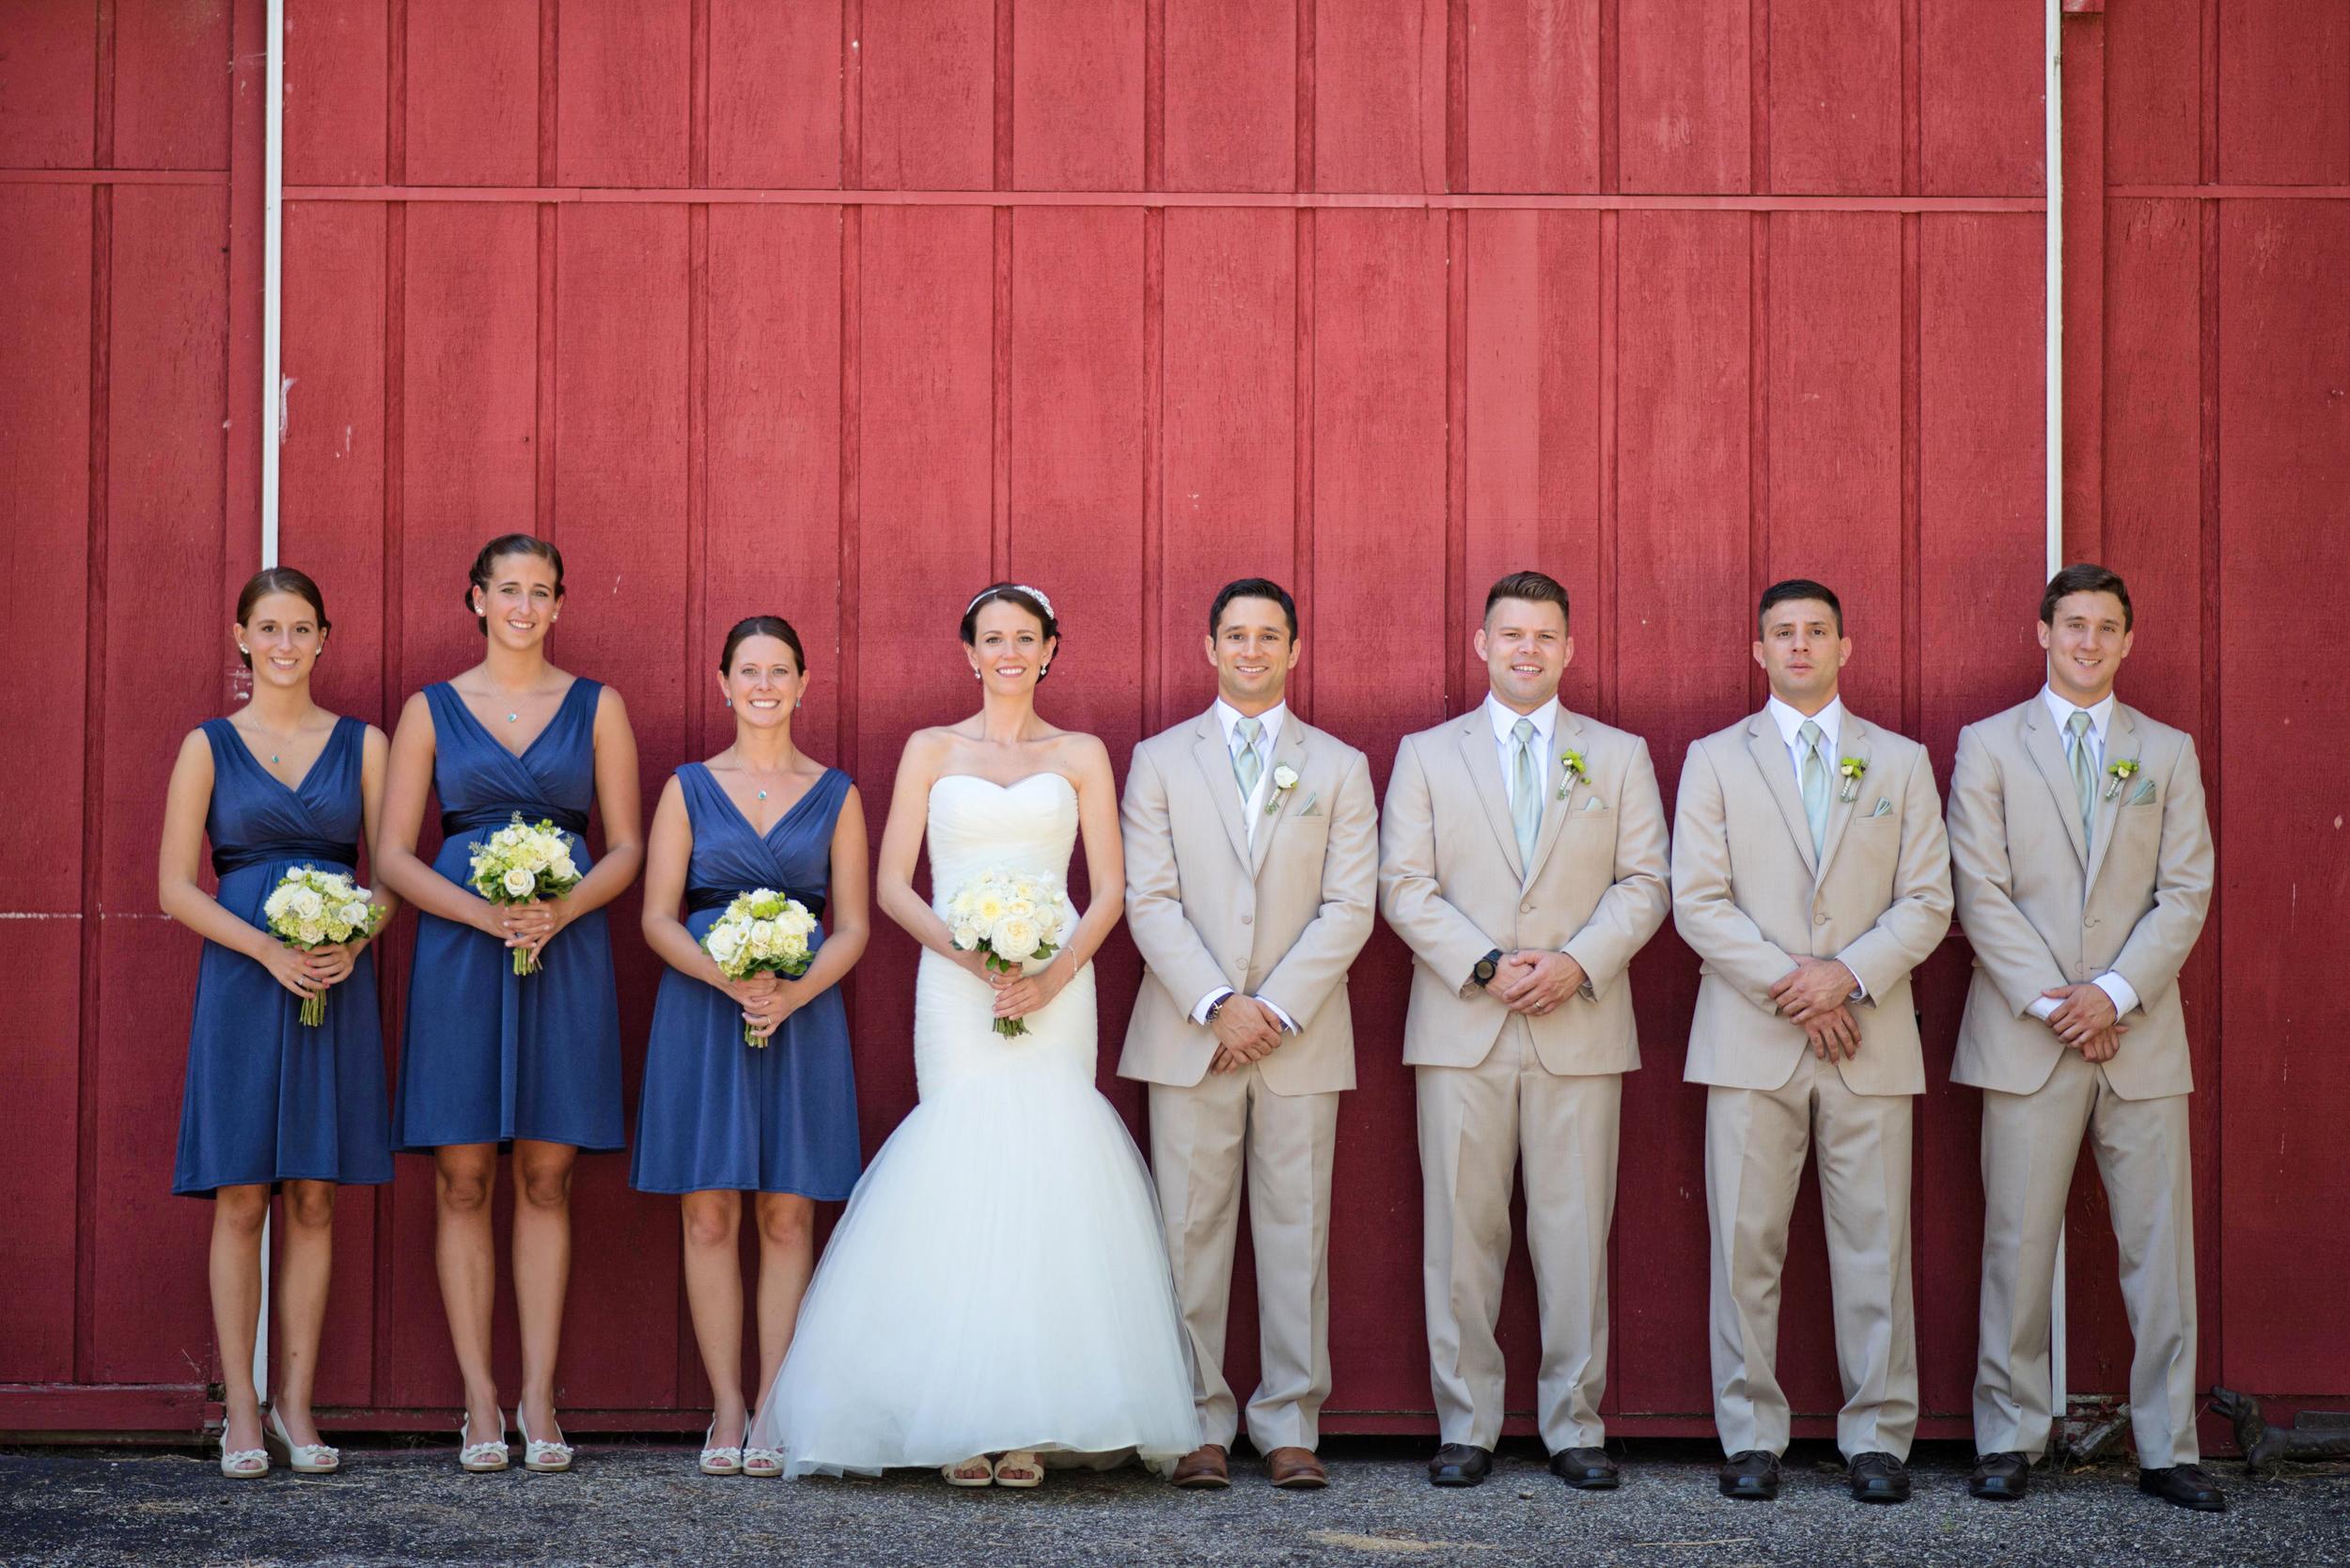 Matt_Swetel_Photography_Erin_and_Jeff_married027.jpg